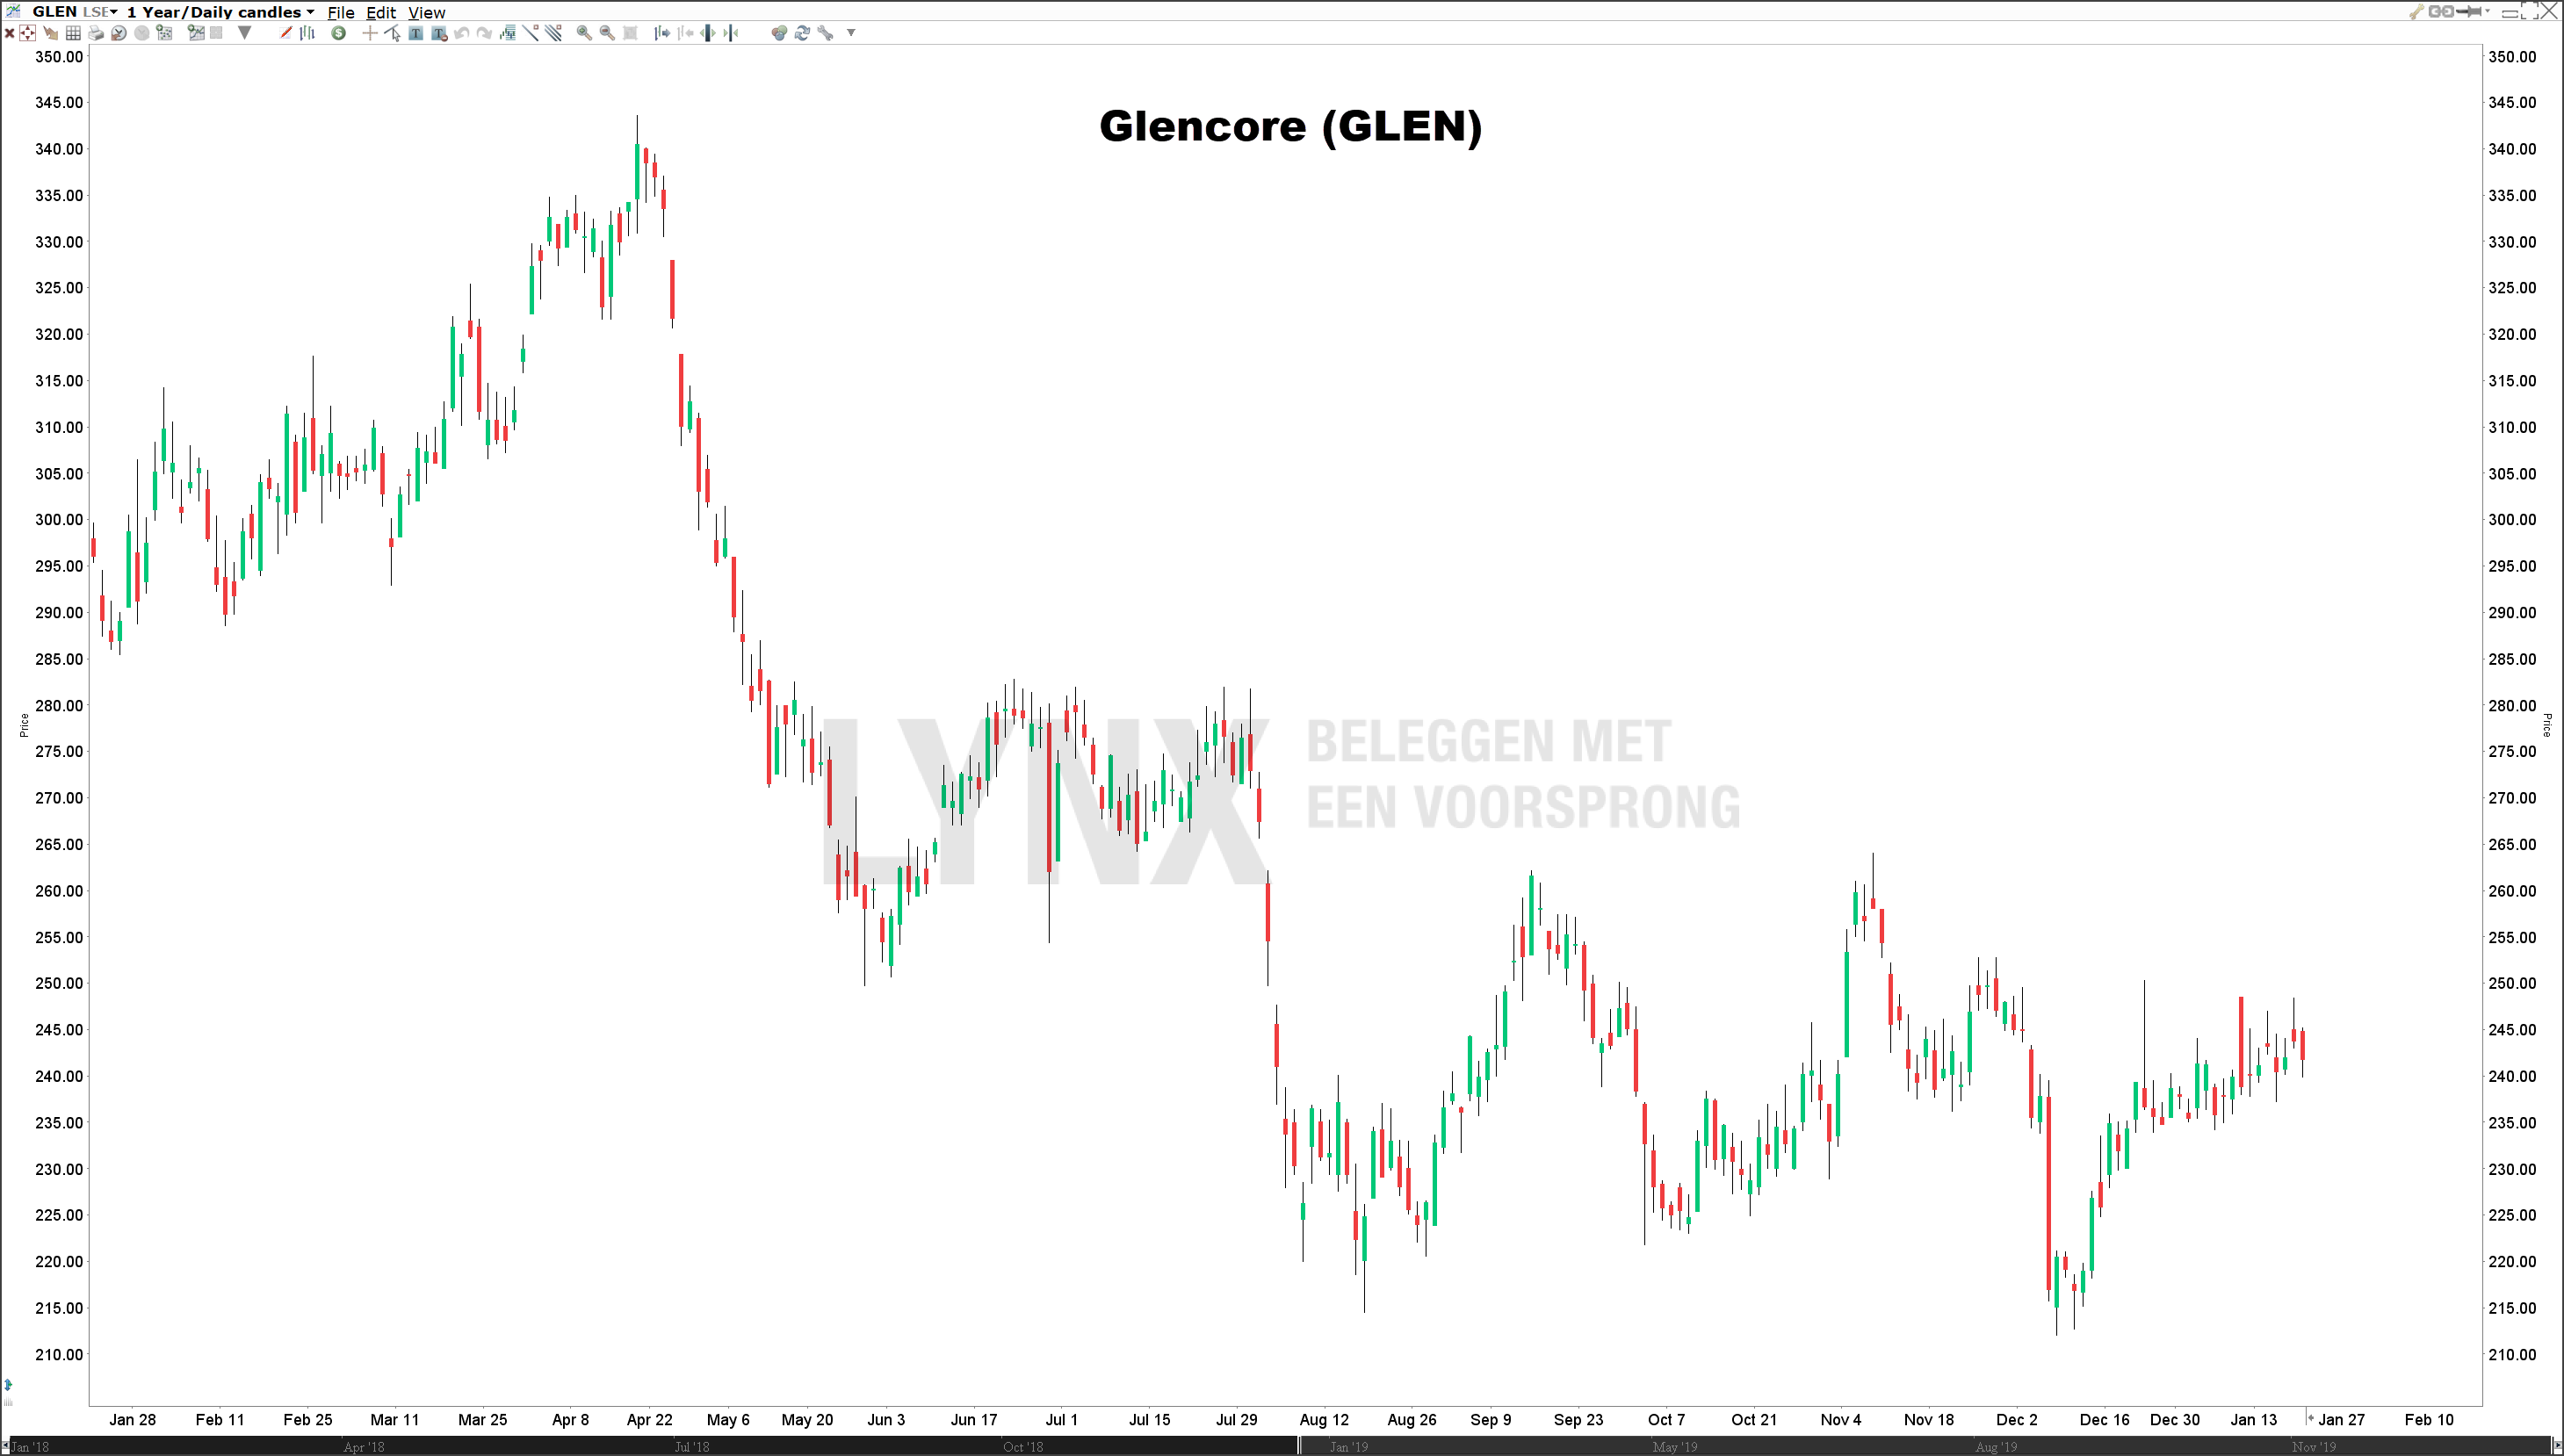 Koers Glencore aandeel